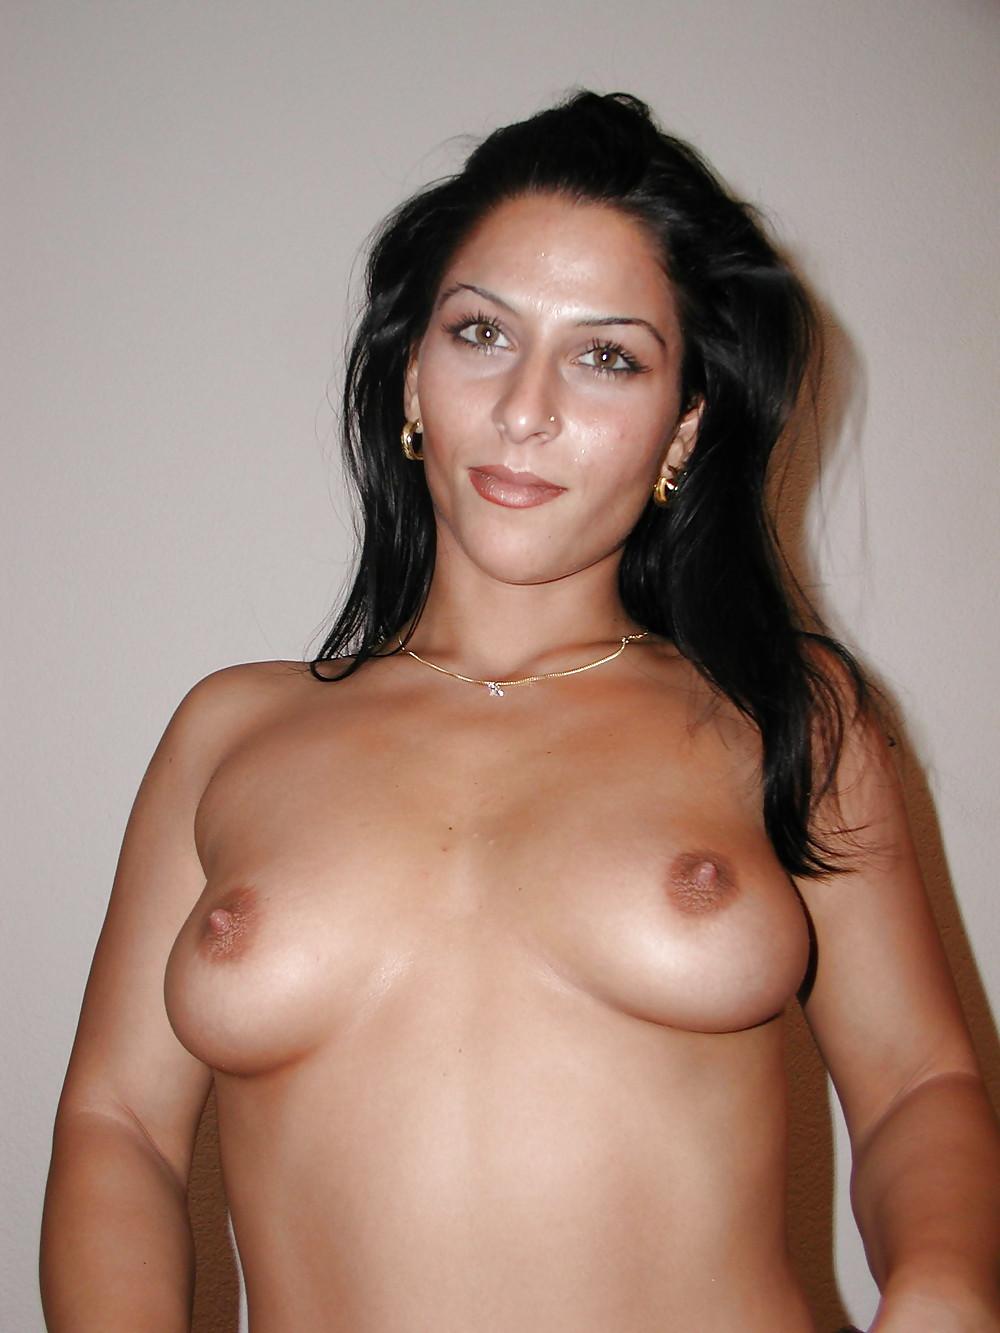 Thick Italian Milf Porn Pics #6907529